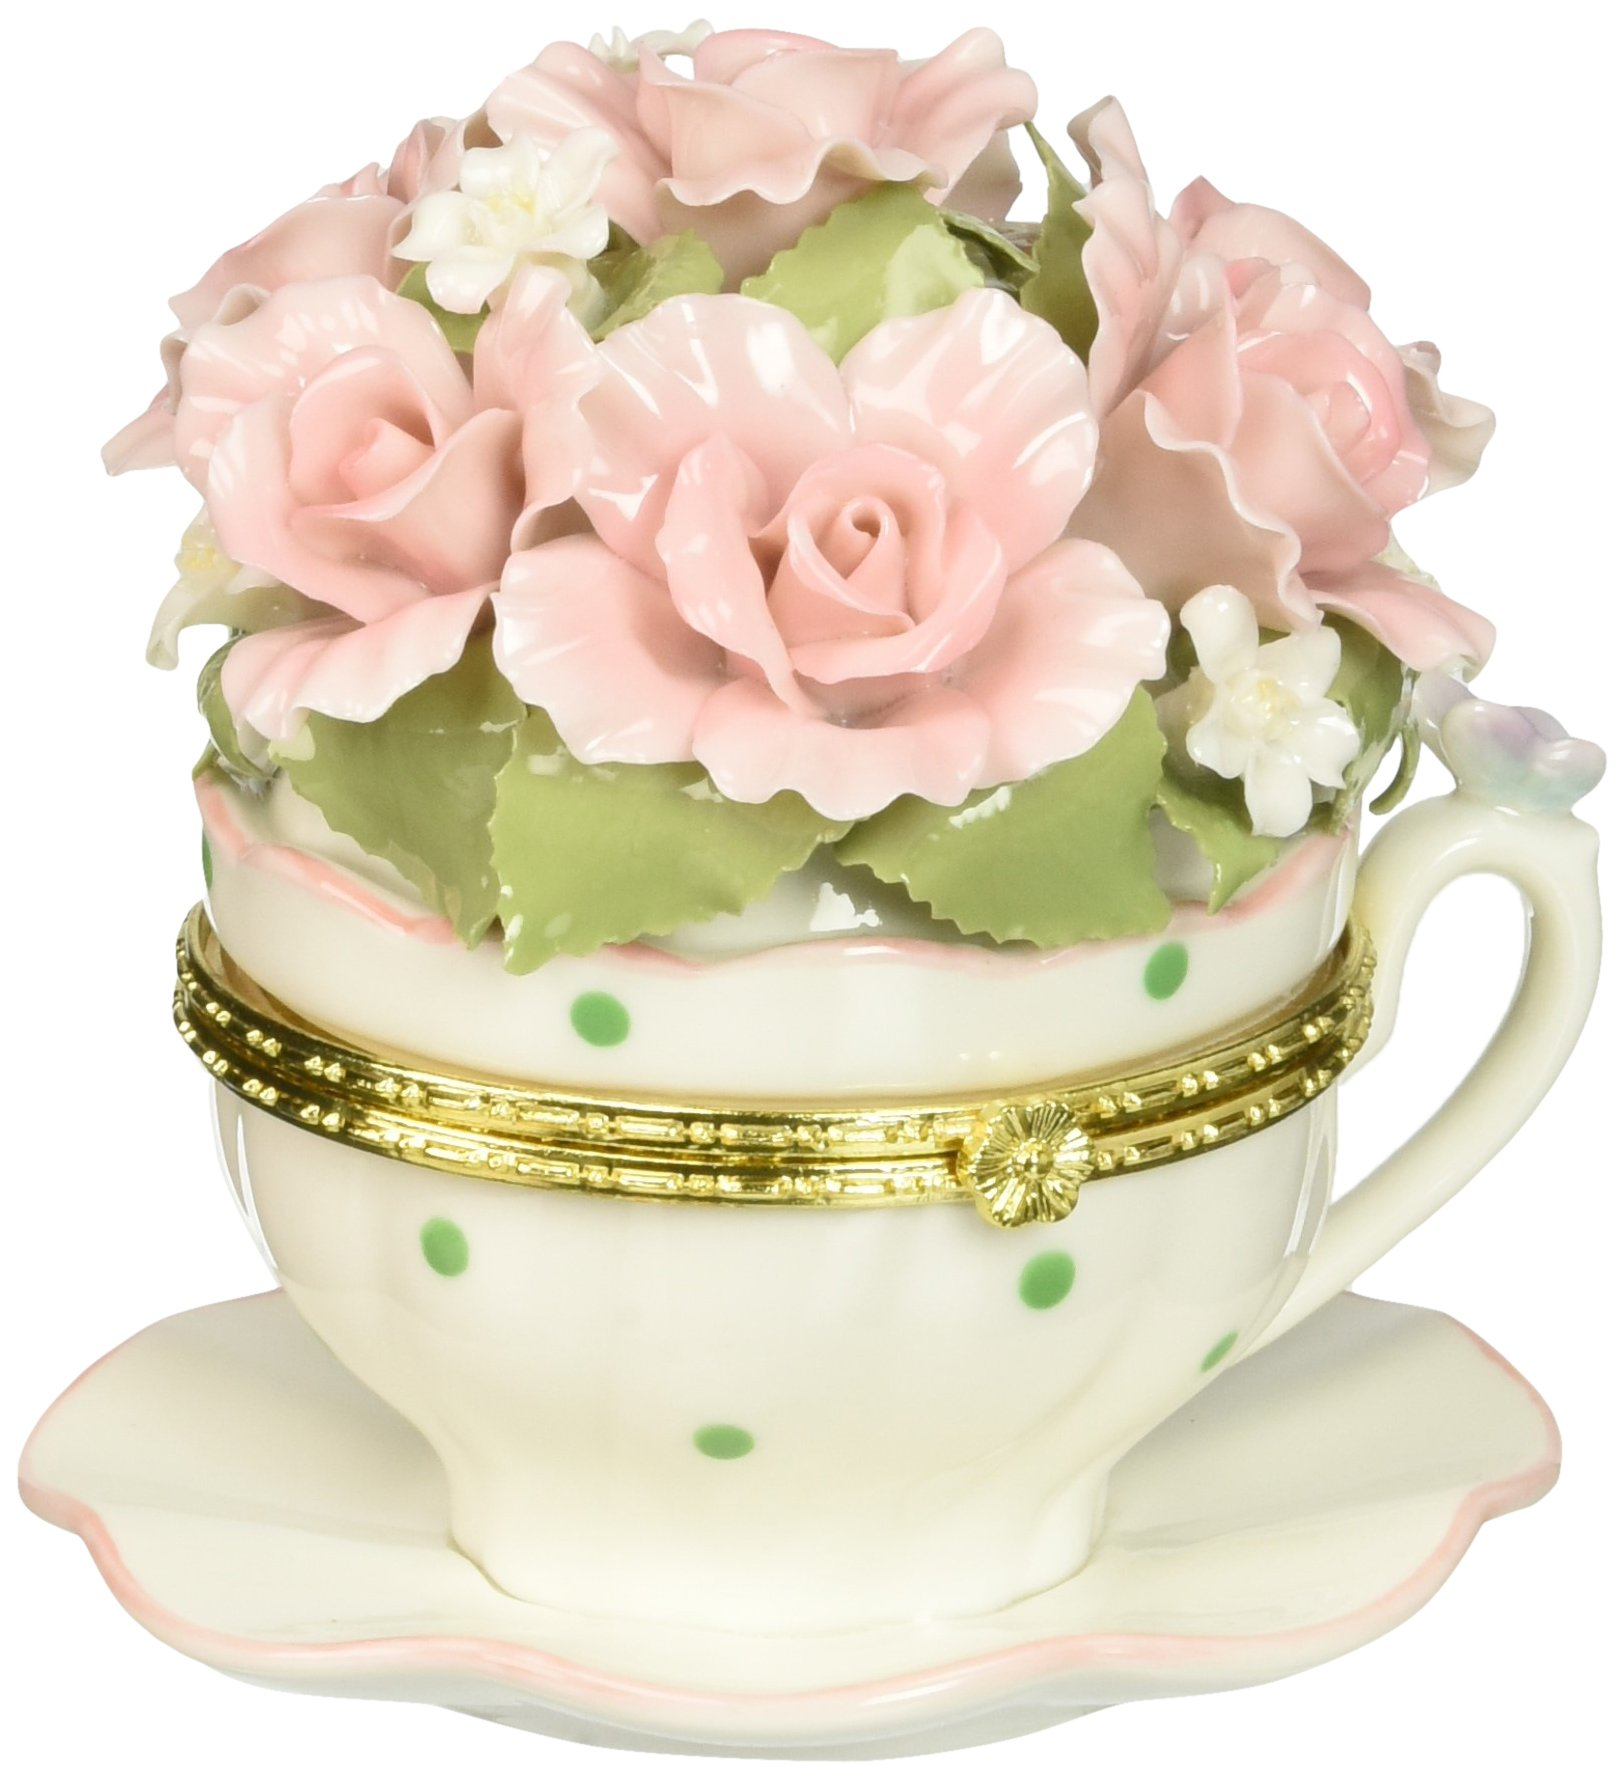 Image of Pretty Teacup Floral Rose Musical Figurine Trinket Box